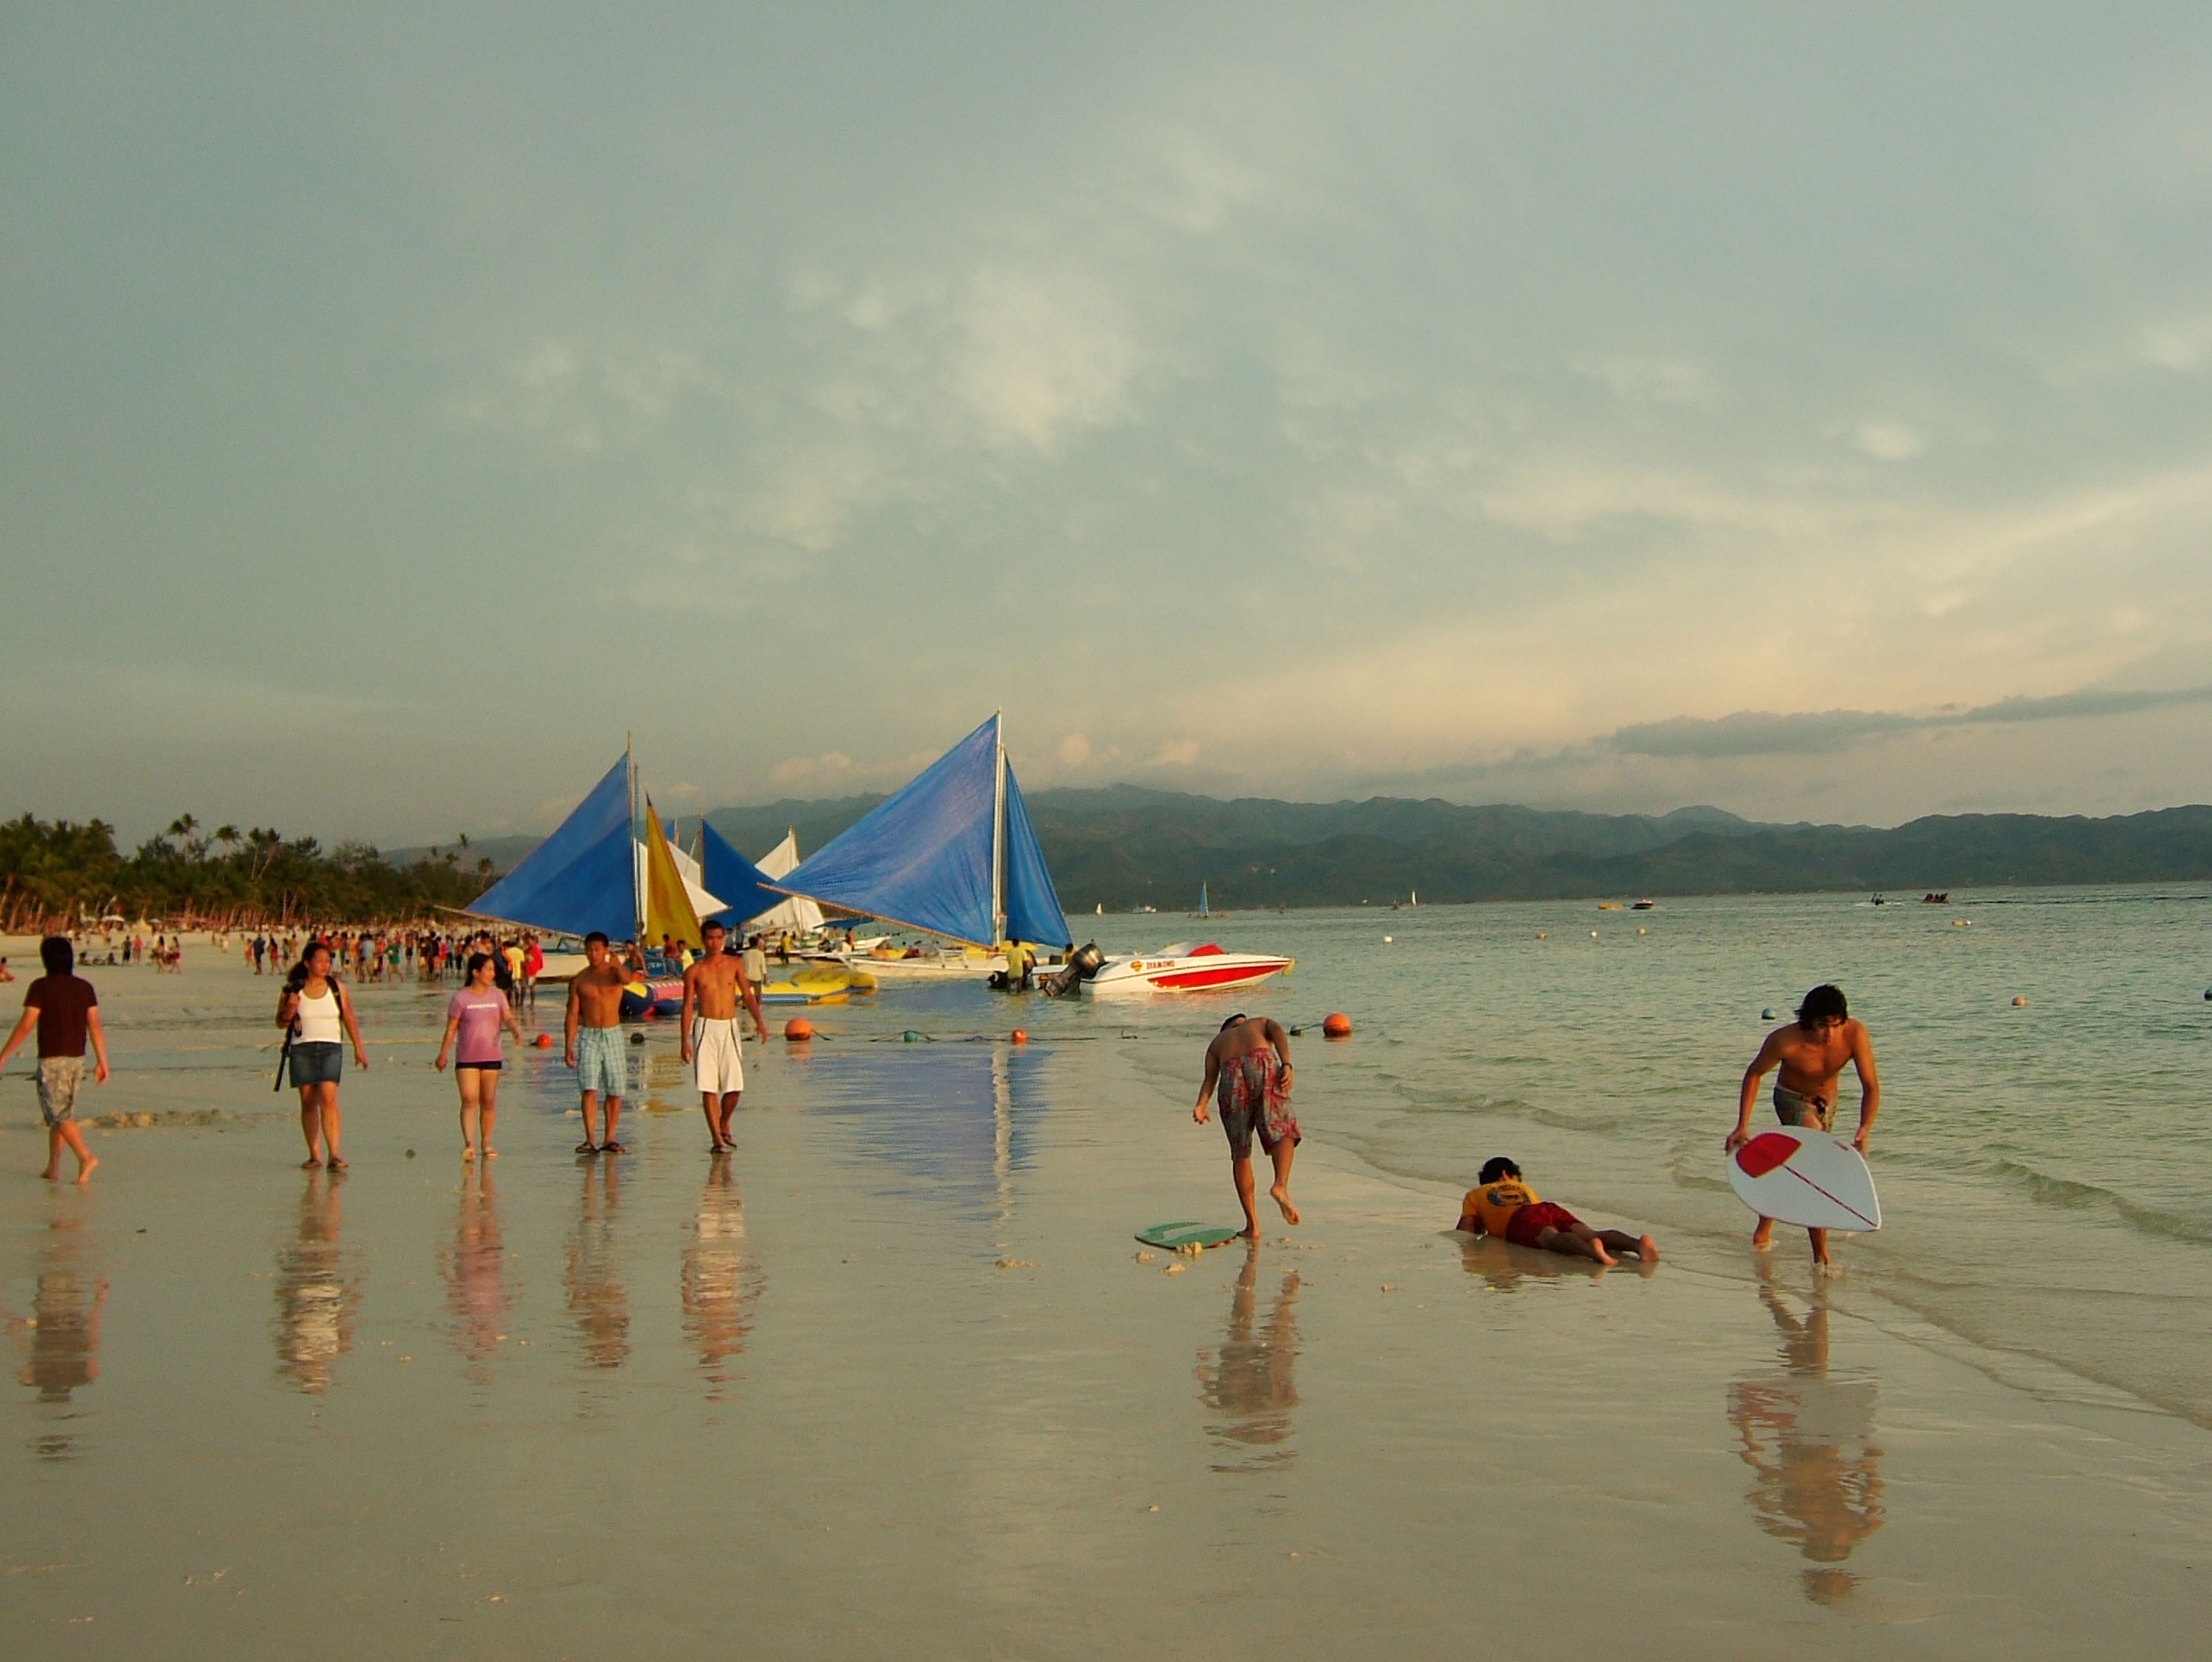 Philippines Sugar Islands Caticlan Boracay White Beach Sunset 2007 14